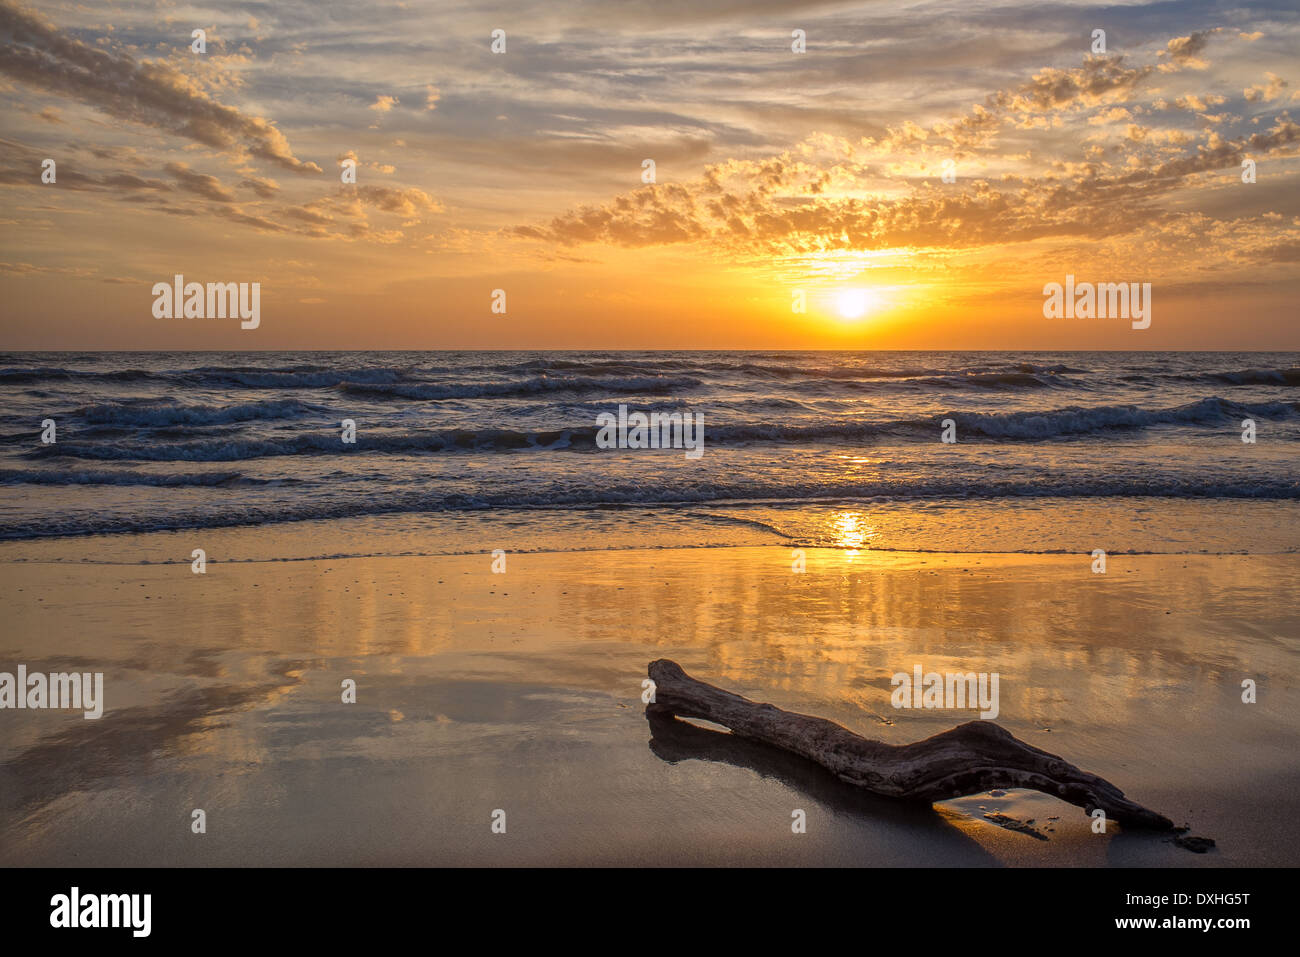 Sunset over the Tyrrhenian Sea - Stock Image